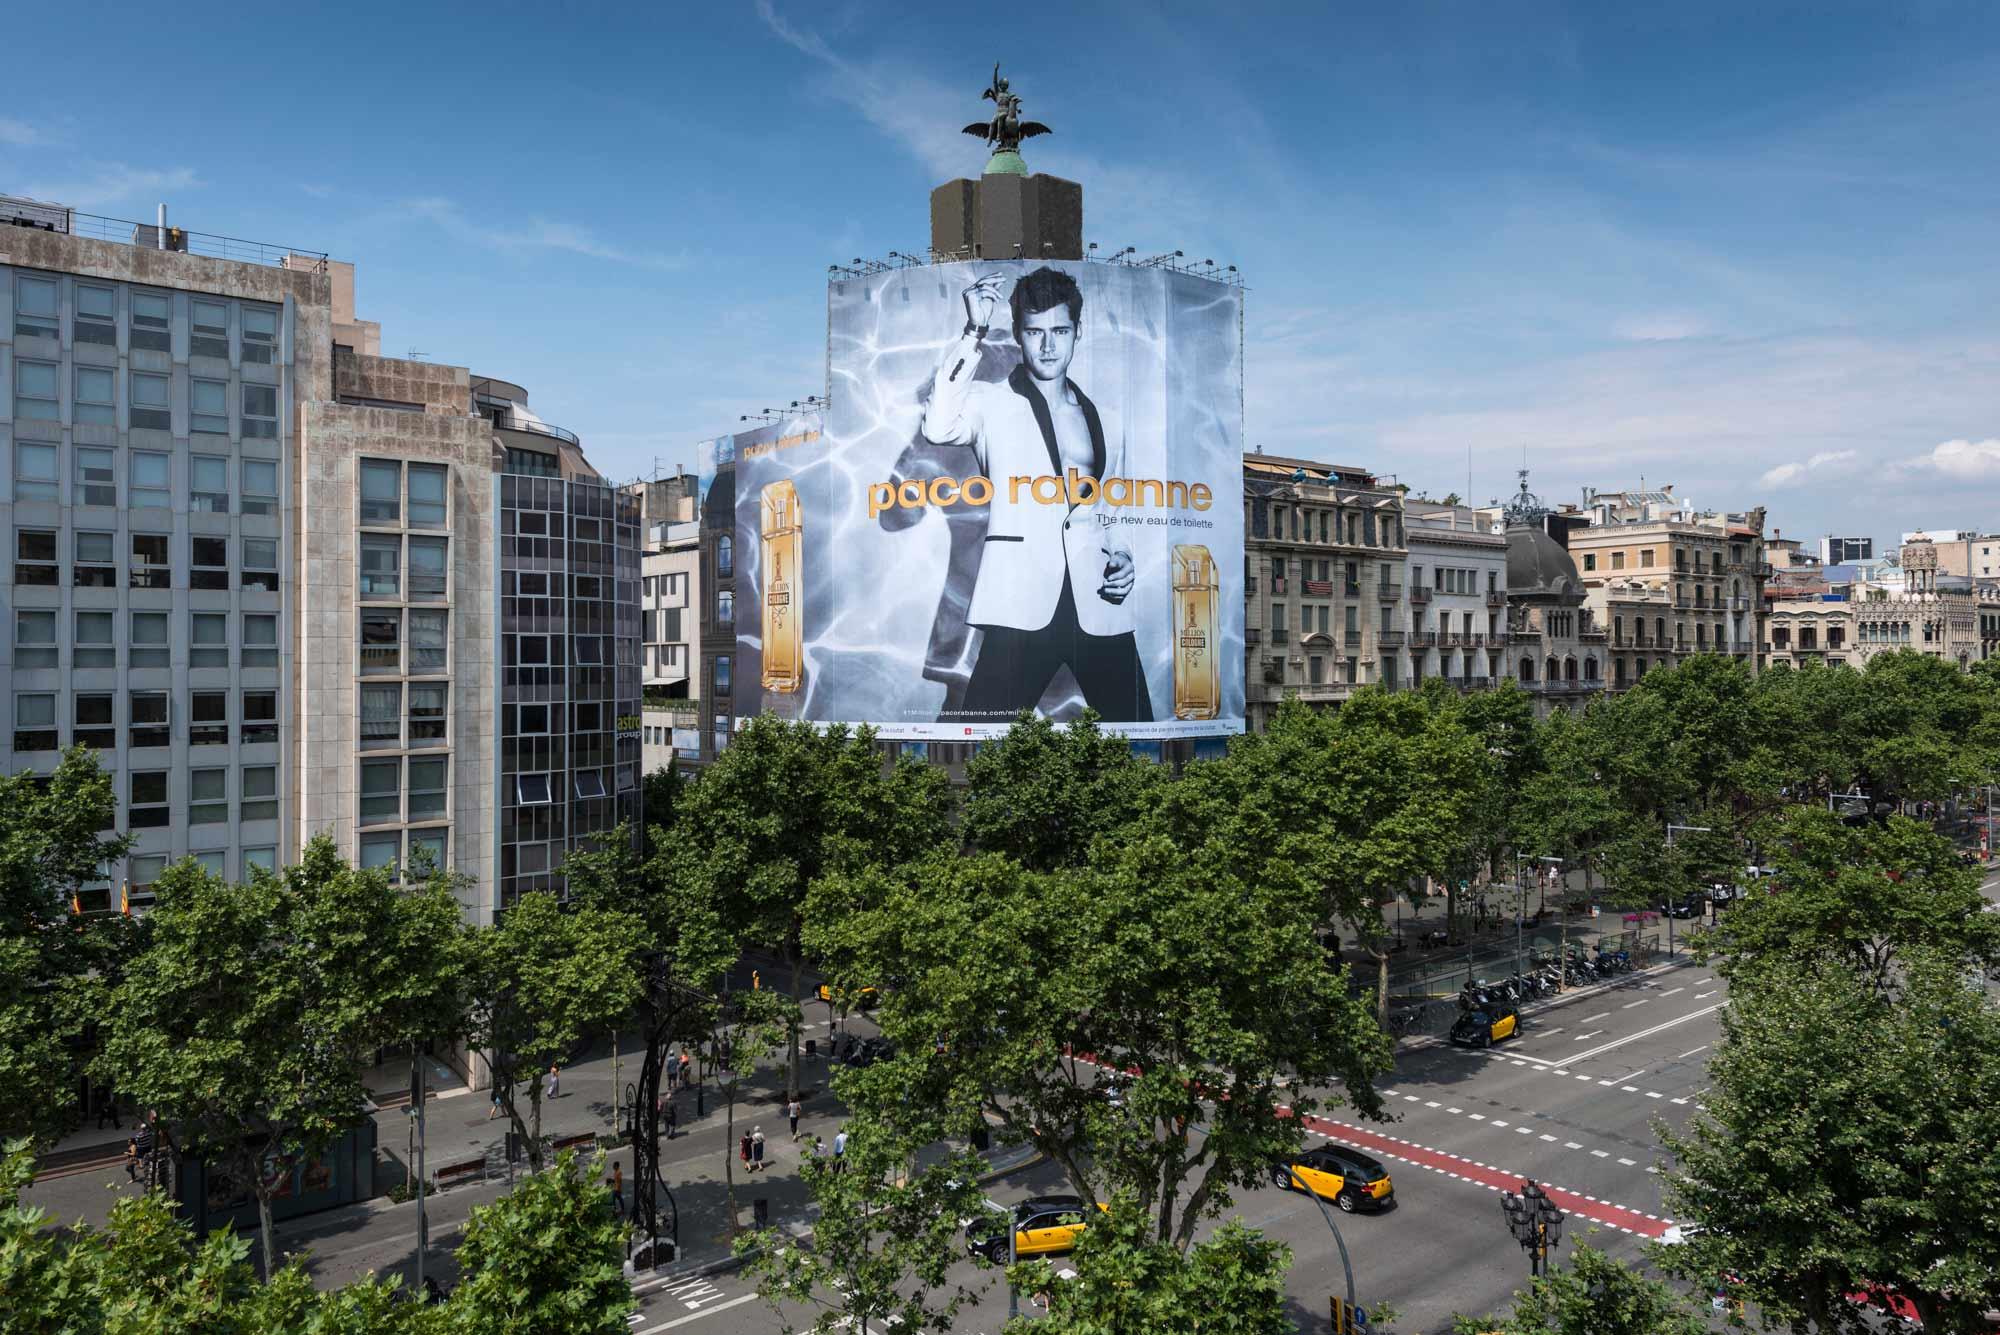 lona-publicitaria-barcelona-paco-rabanne-puig-paseo-de-gracia-vsa-comunicacion